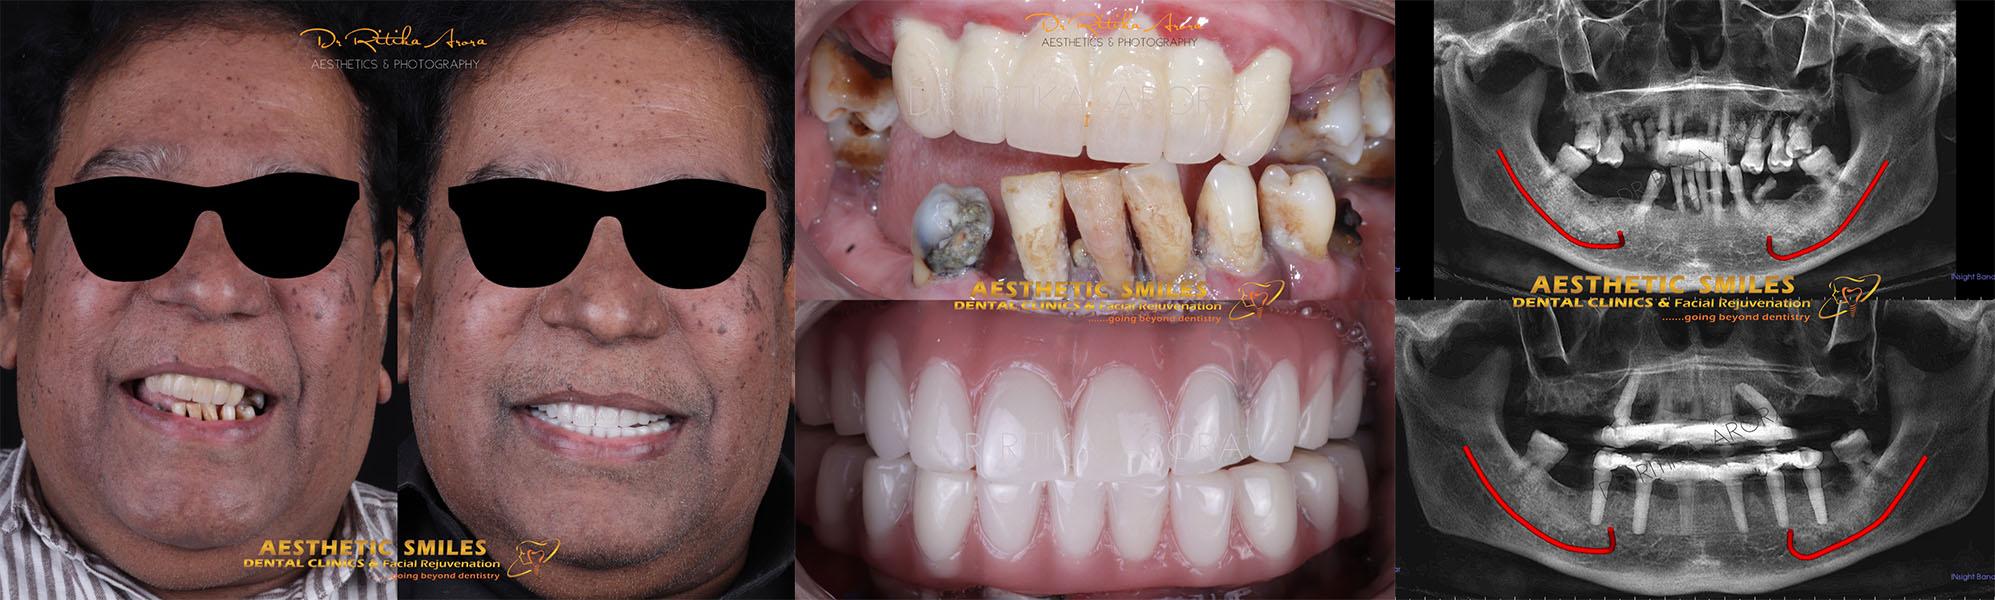 dental implants in mumbai case 2